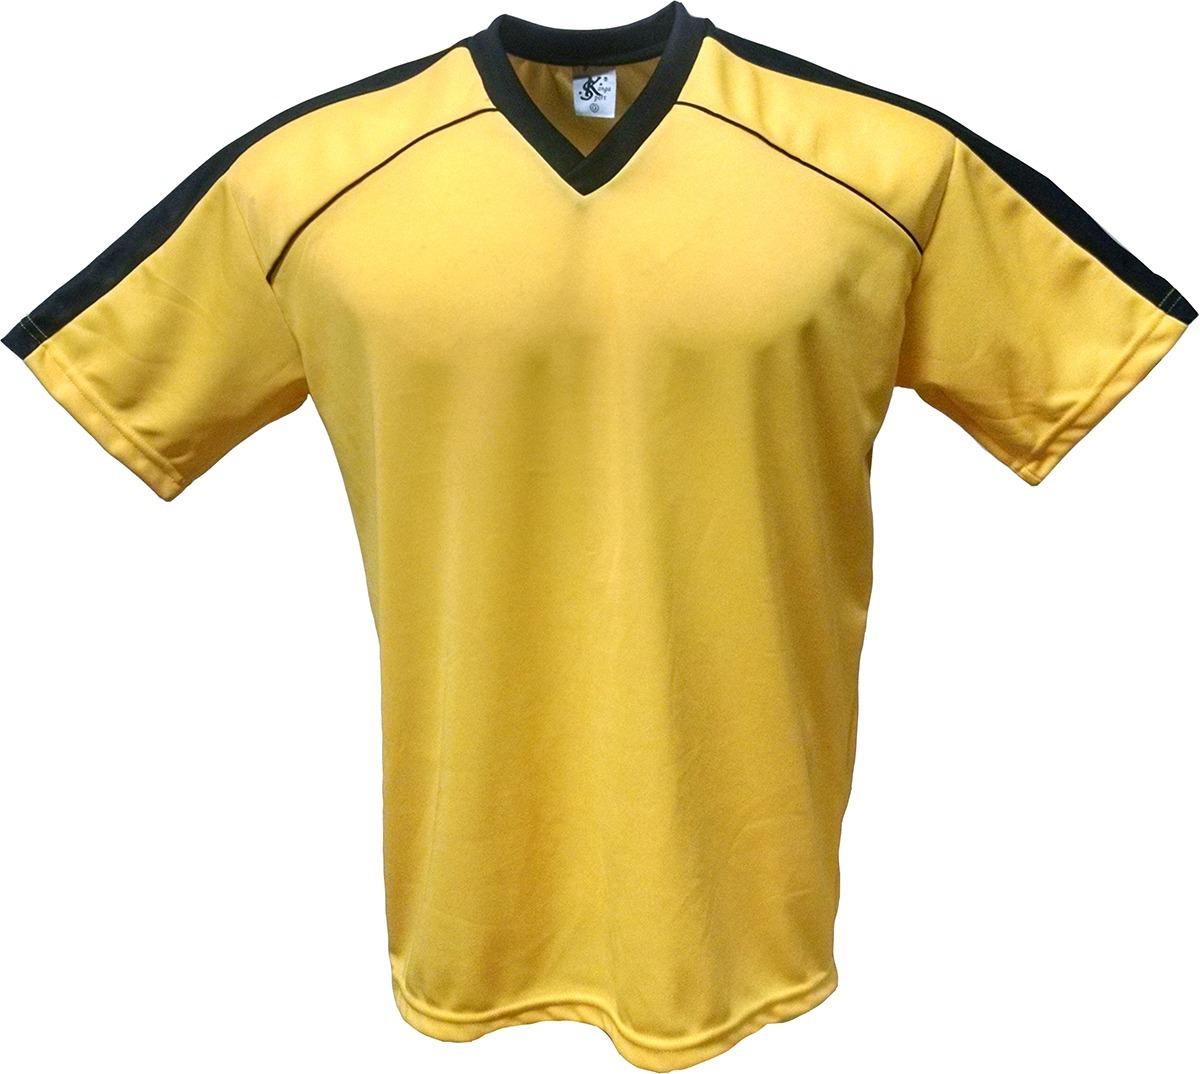 9942c1a8c1 Kit 5 Camisa Numerada Fardamento Uniforme Esportivo Futebol - R  148 ...